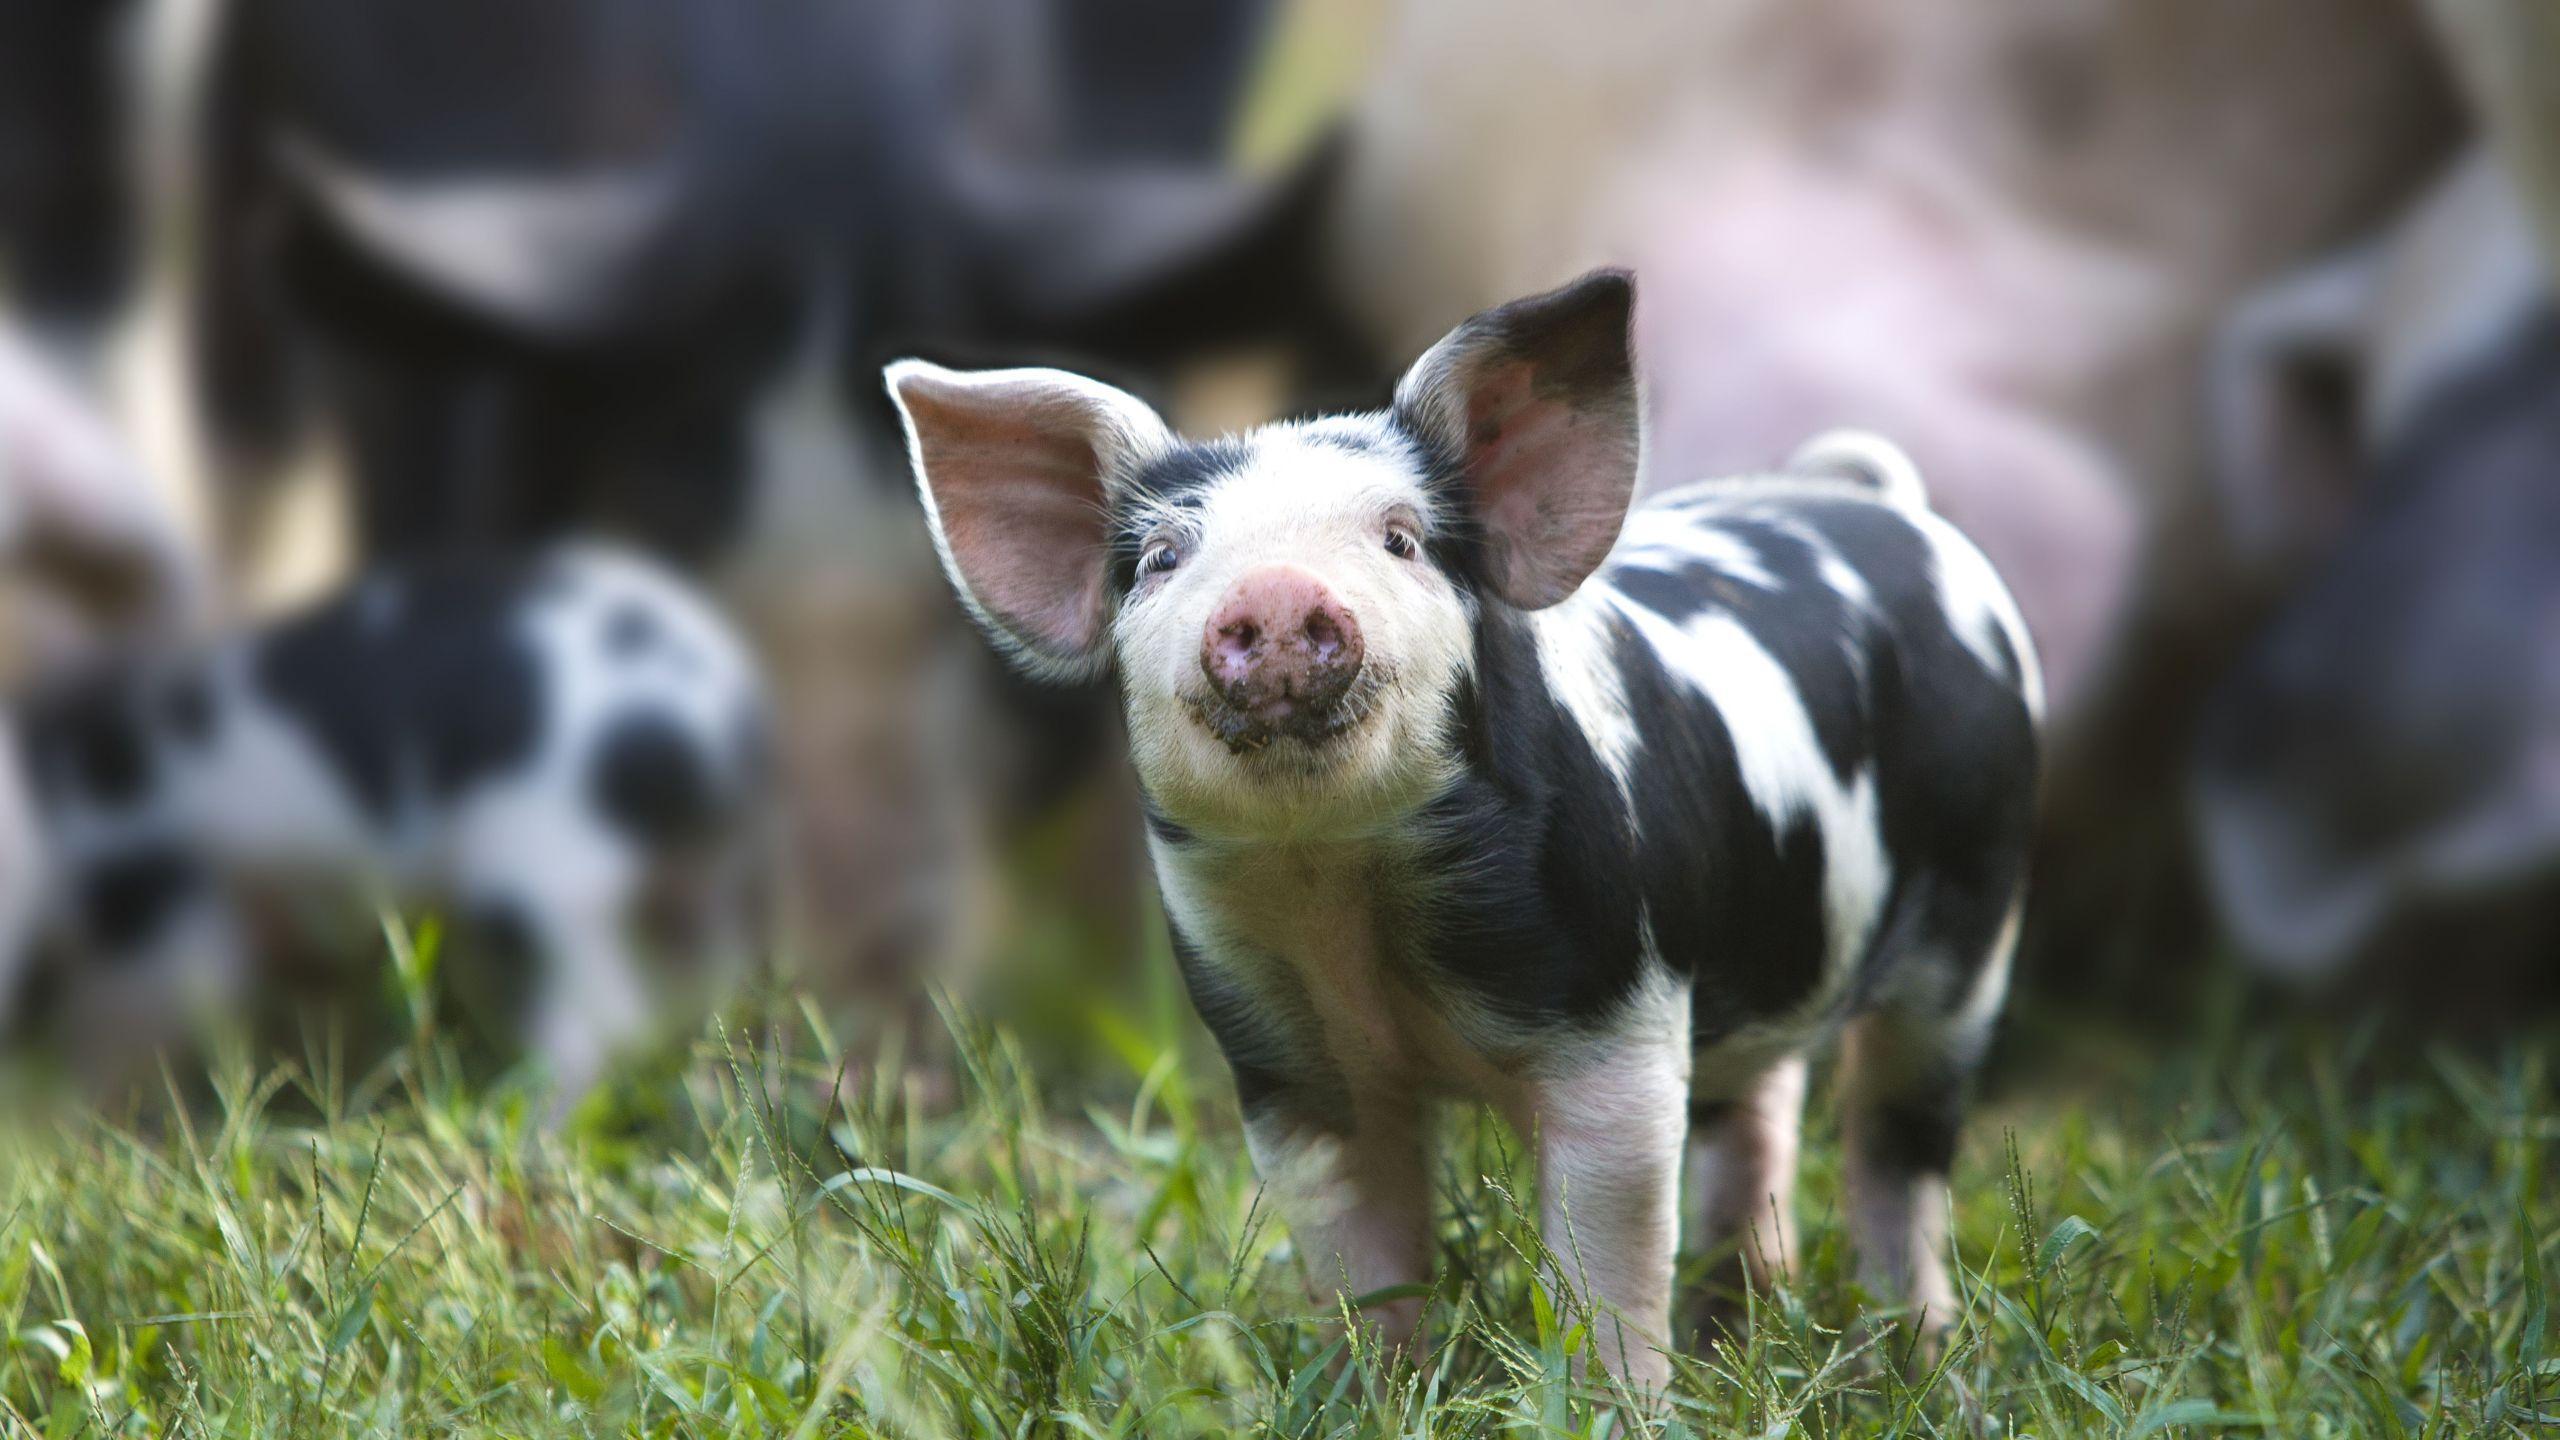 5 Farm Animals Preschool Projects Organic Pig Farm